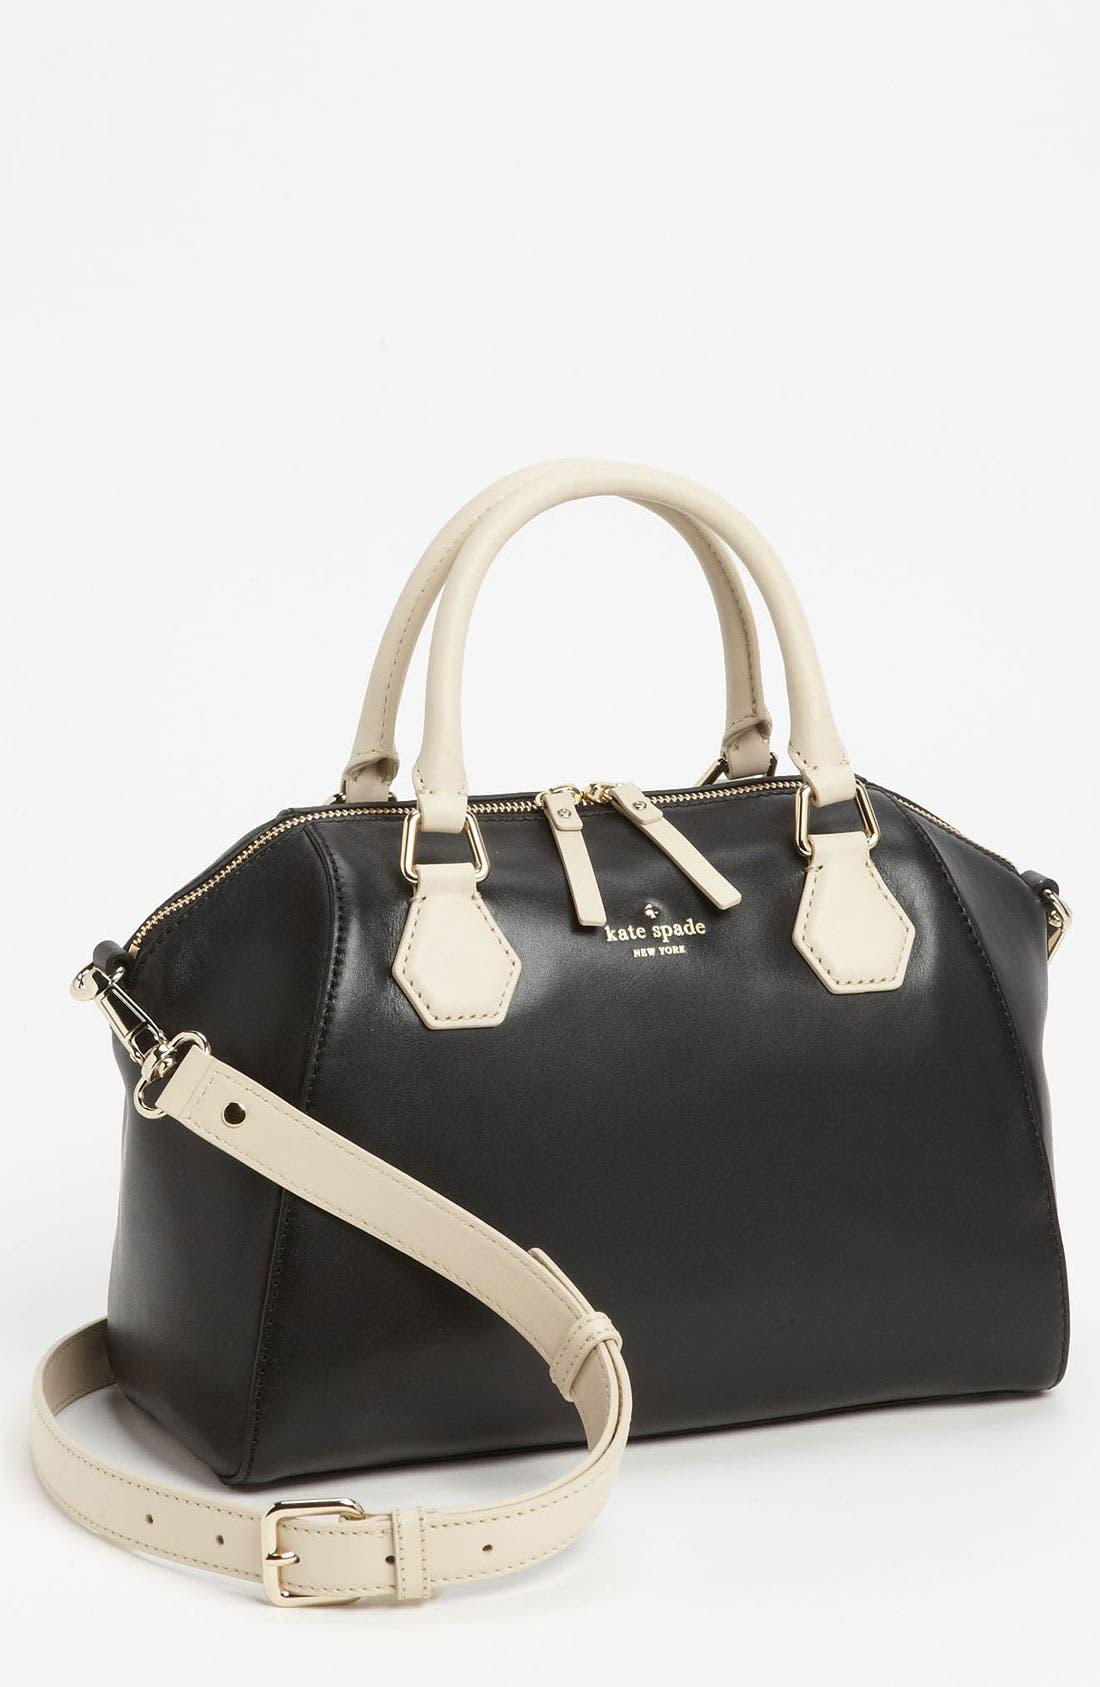 Main Image - kate spade new york 'catherine street - pippa' satchel